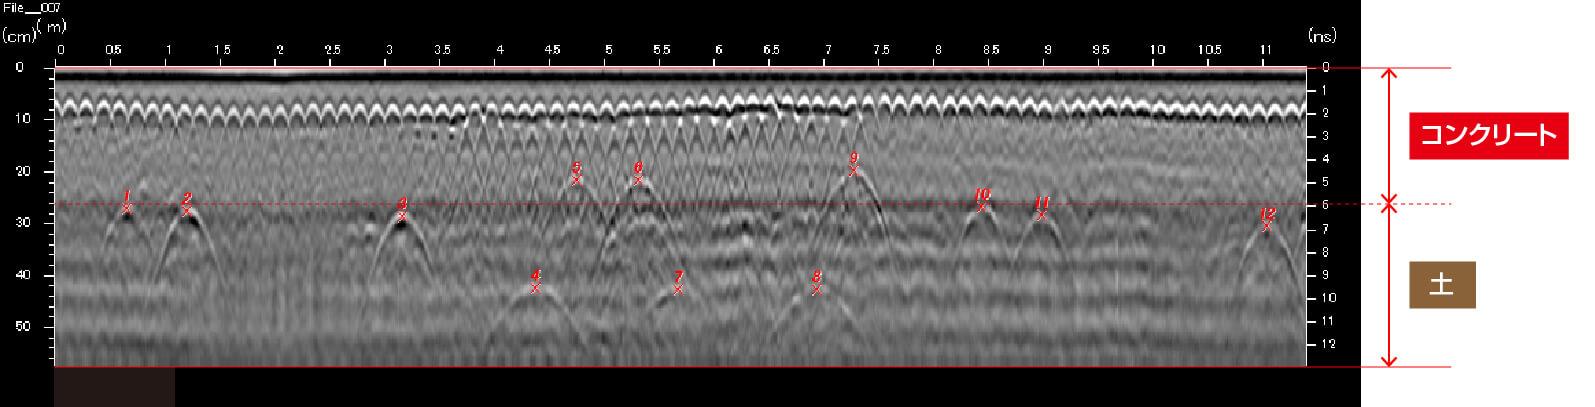 密集配筋下の配管探査例 電磁波レーダ